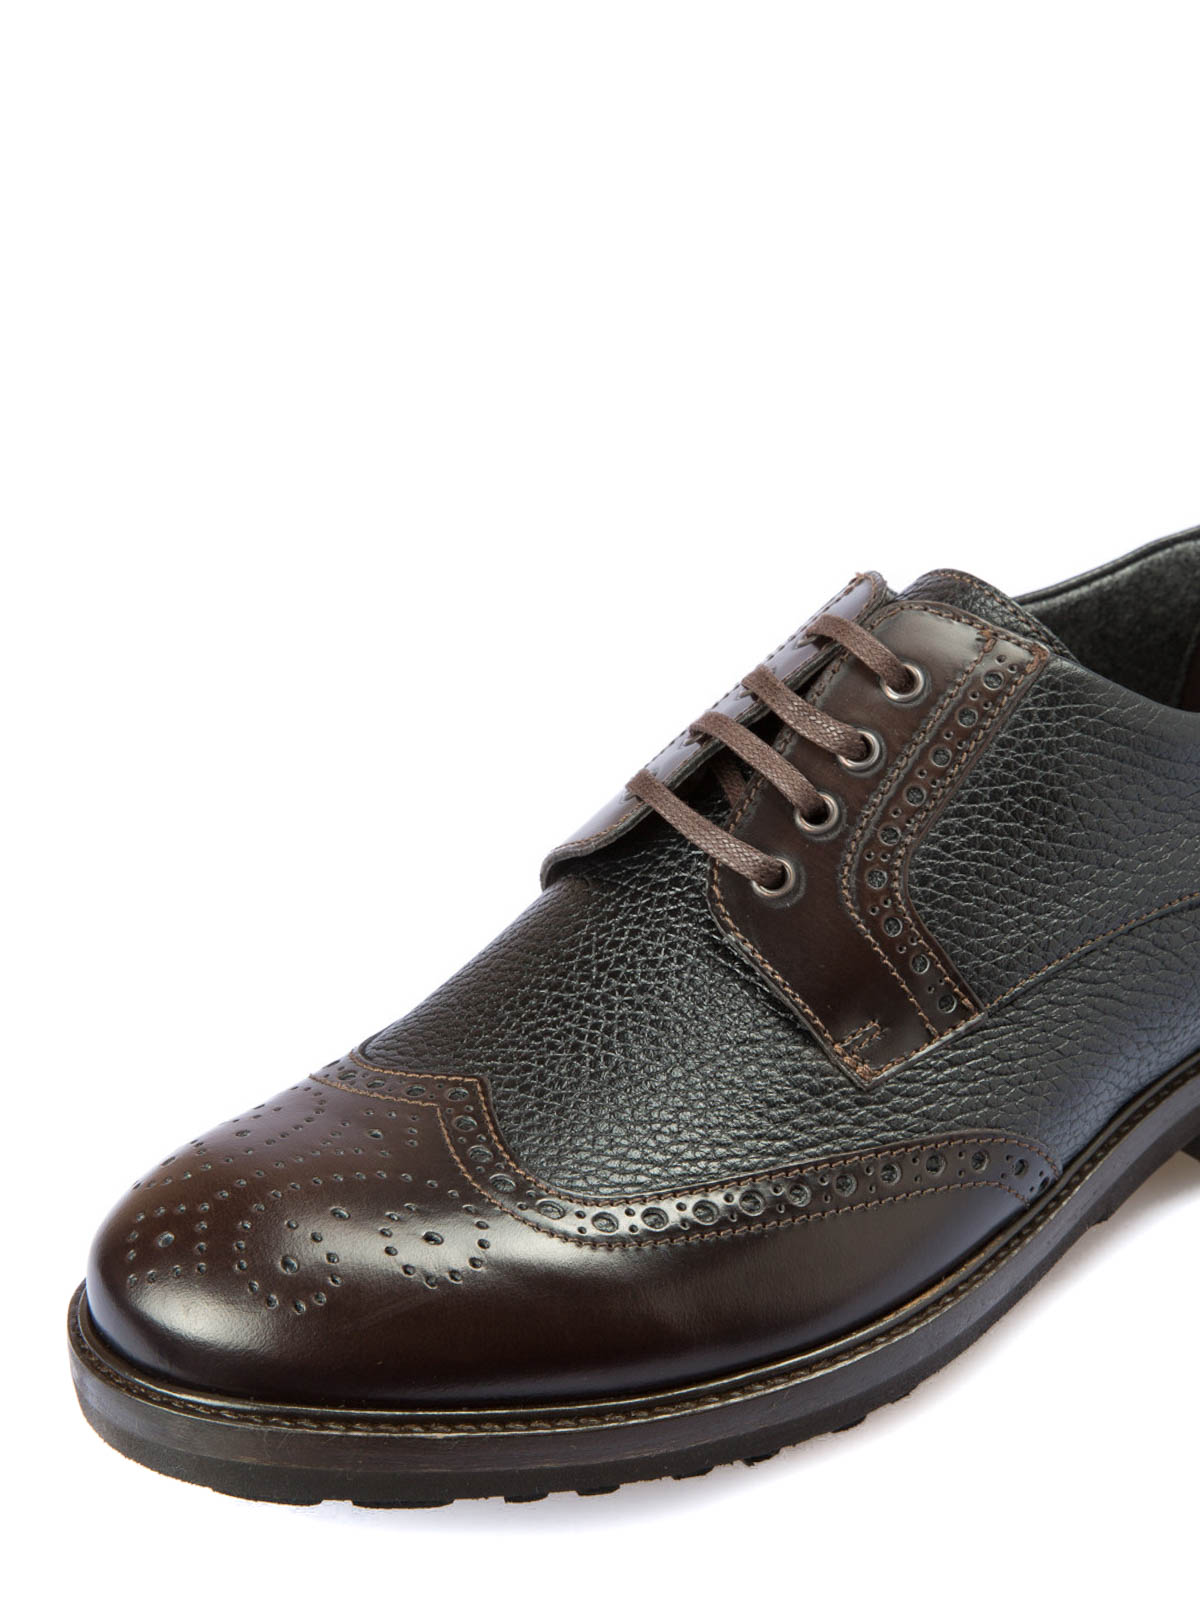 Corneliani Derby brogue in pelle martellata scarpe